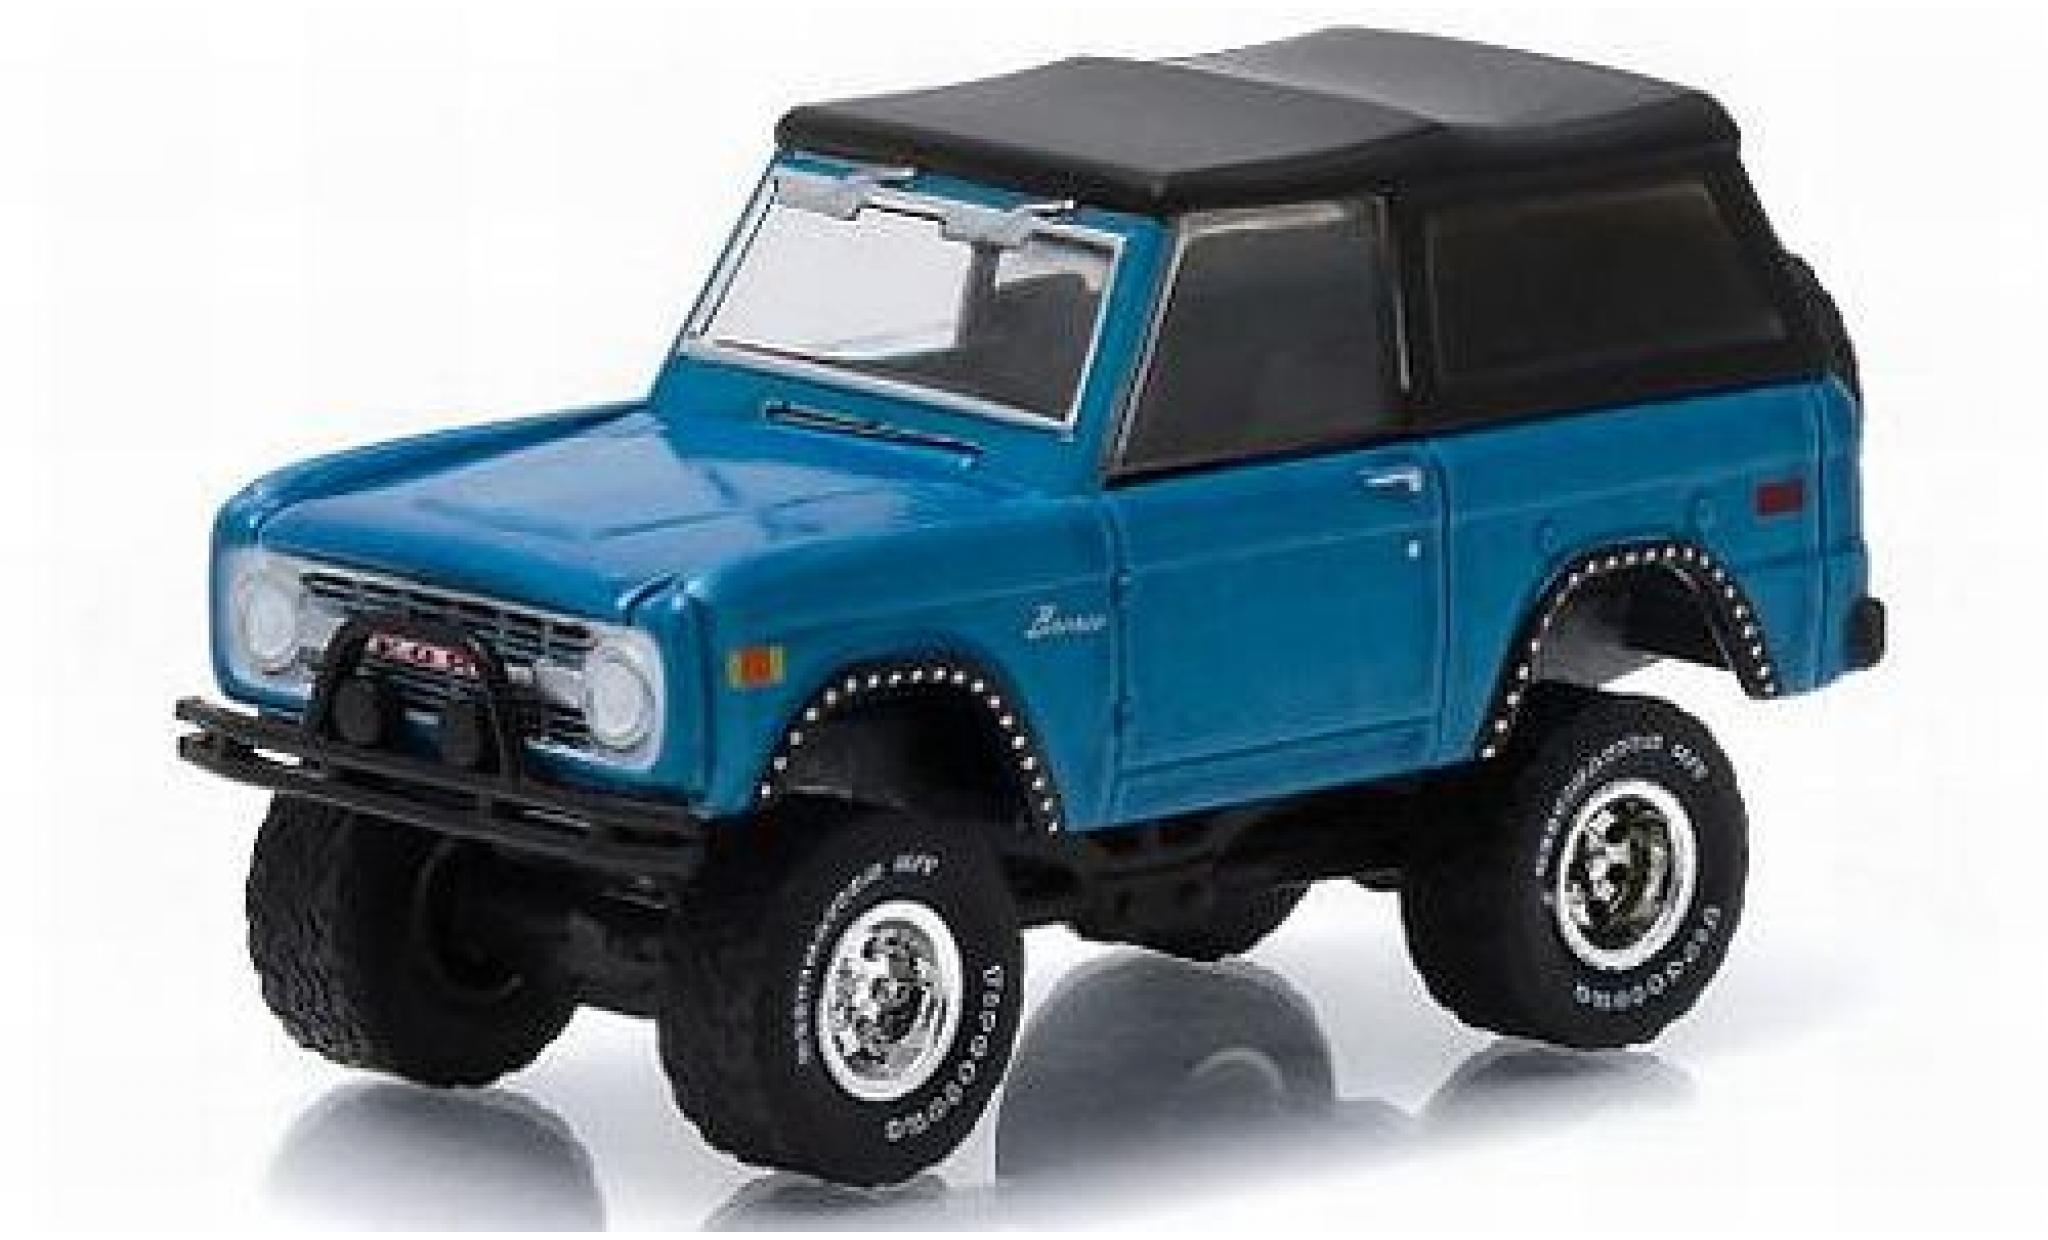 Ford Bronco 1/64 Greenlight metallise bleue 1975 All-Terrain Series 2